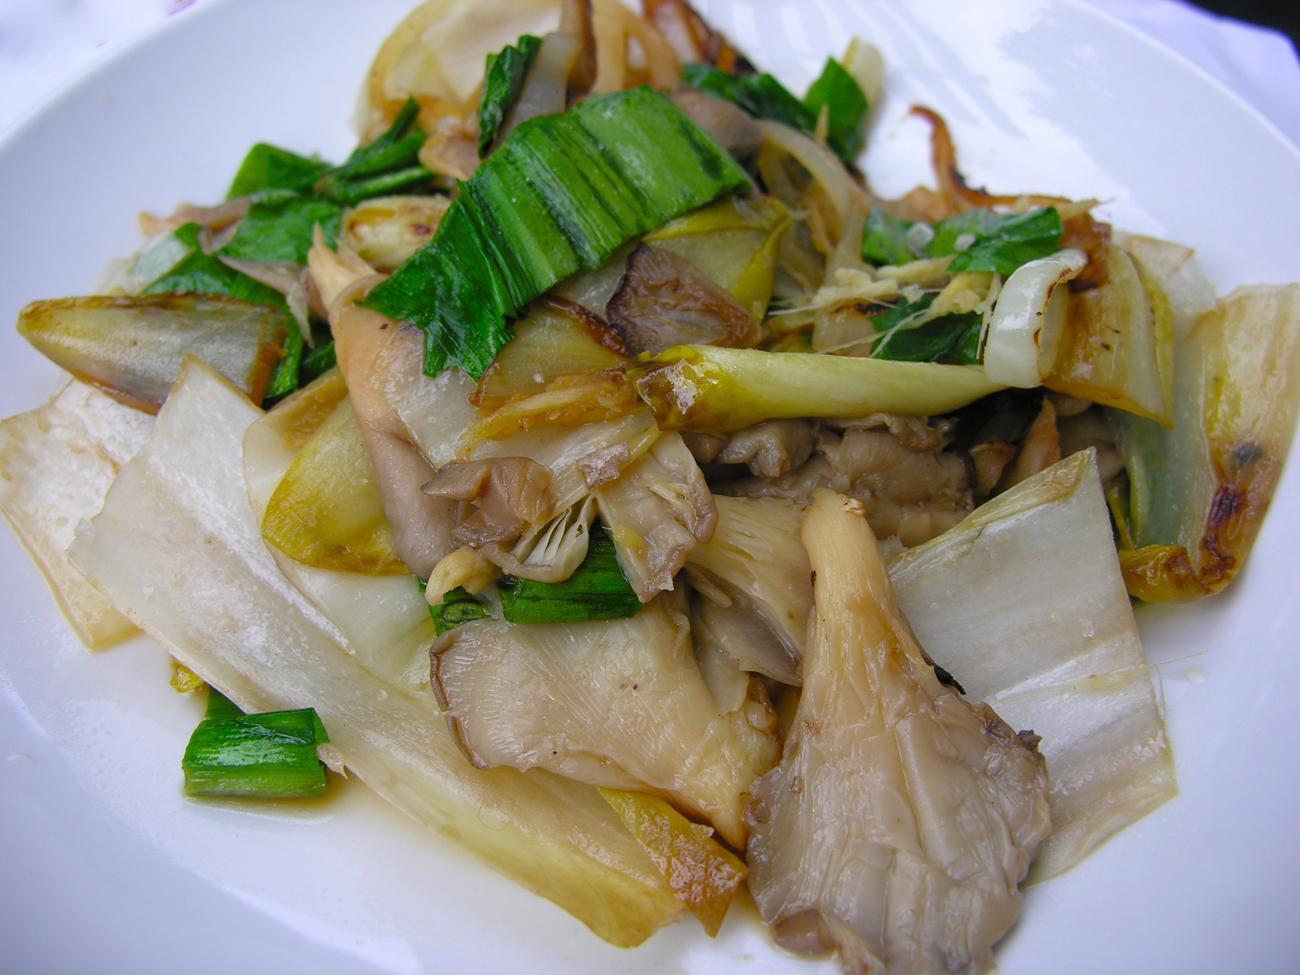 Warm endive, ramp, and oyster mushroom salad